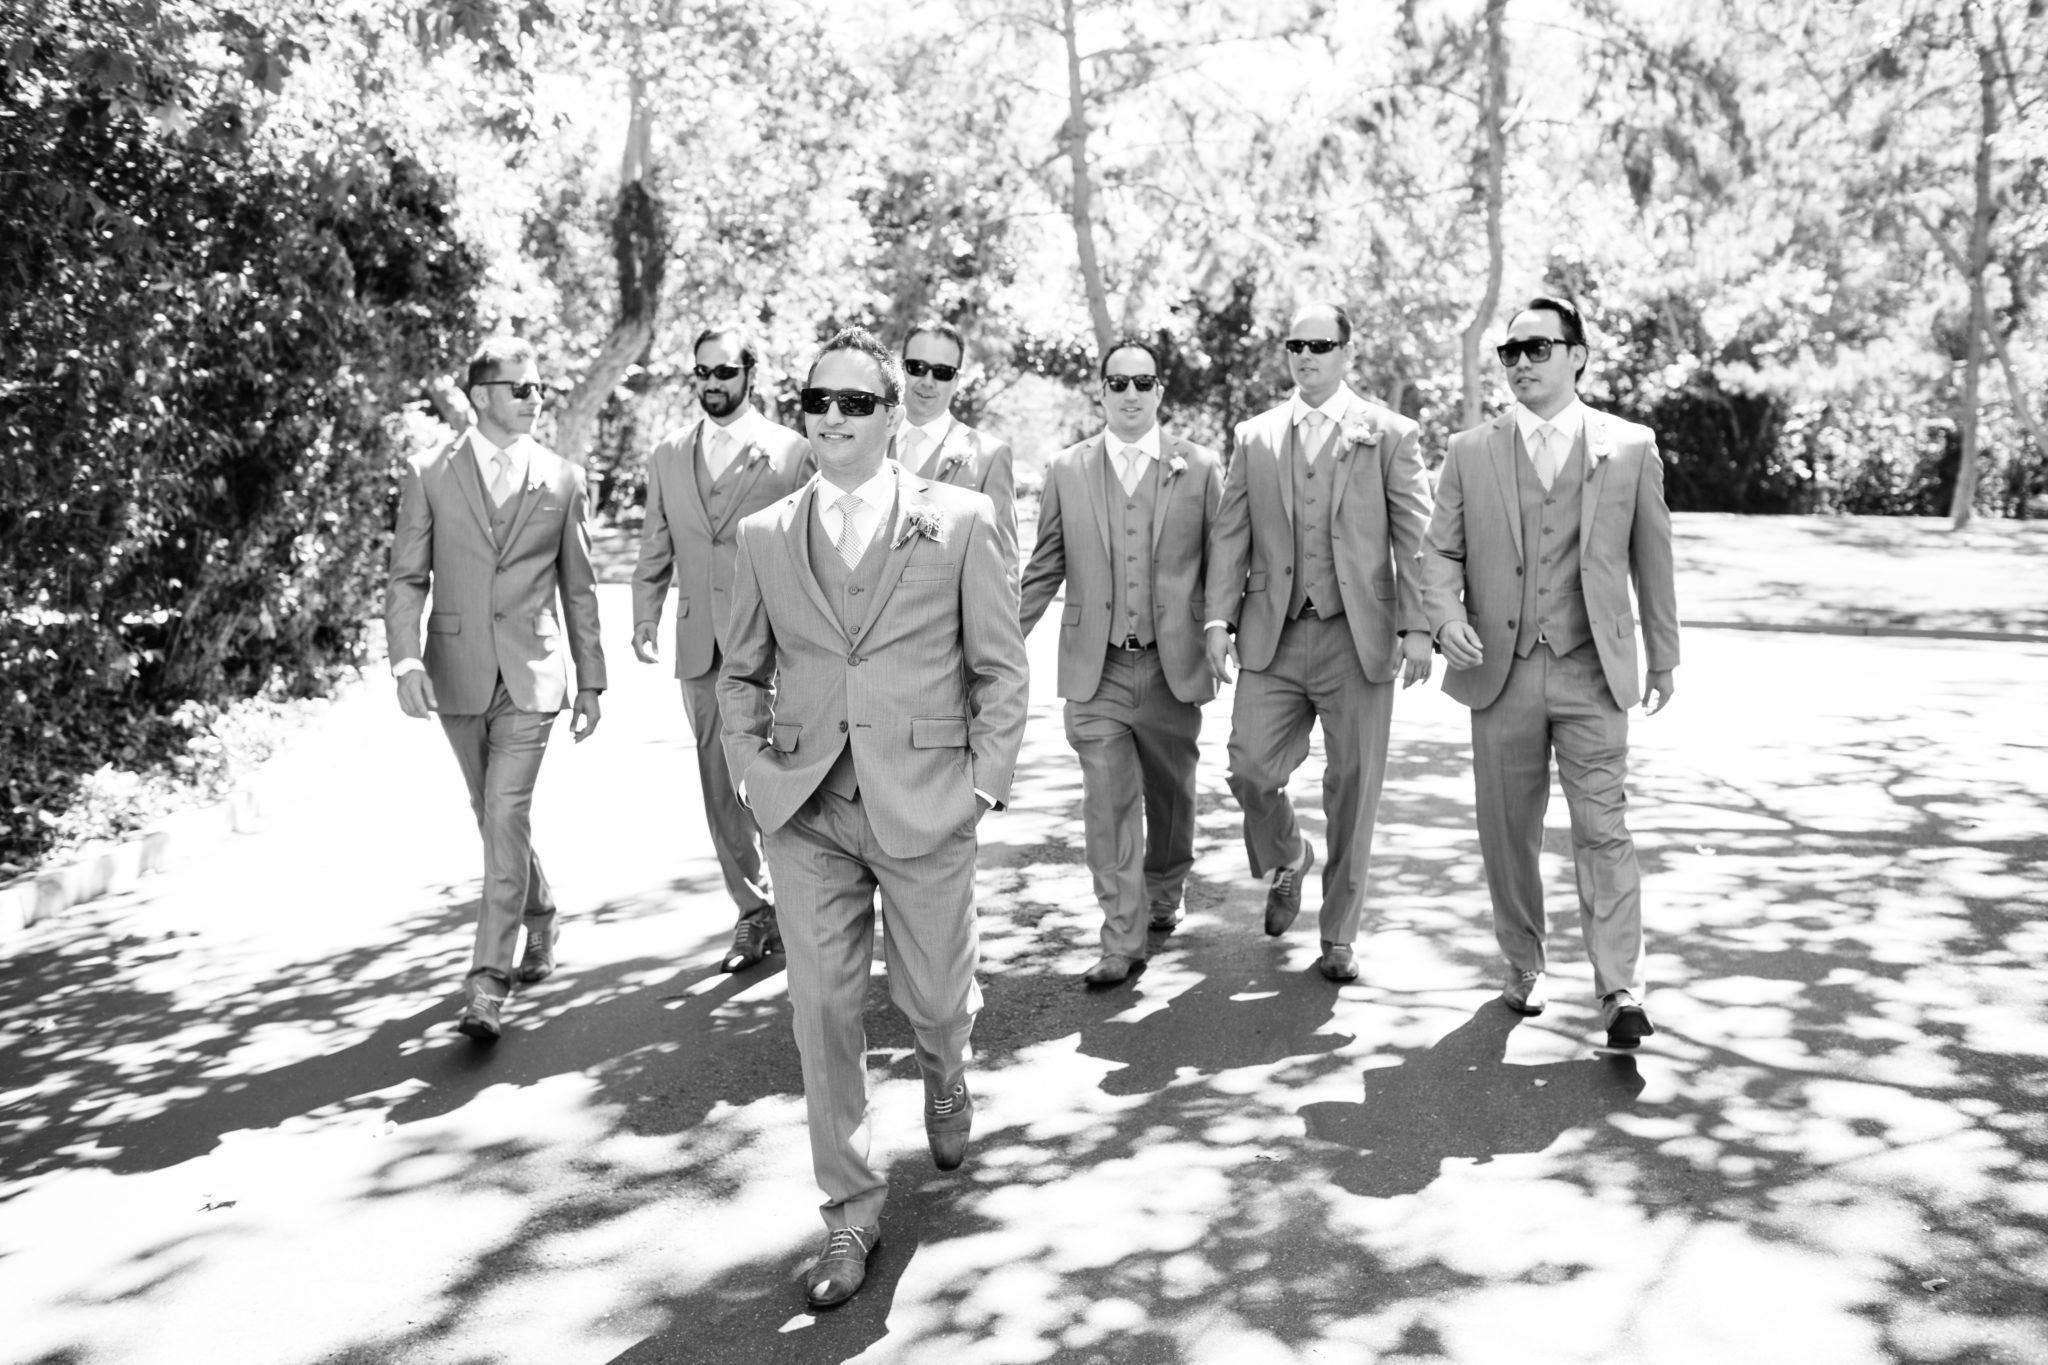 Temecula_Creek_Inn_Wedding_025.jpg